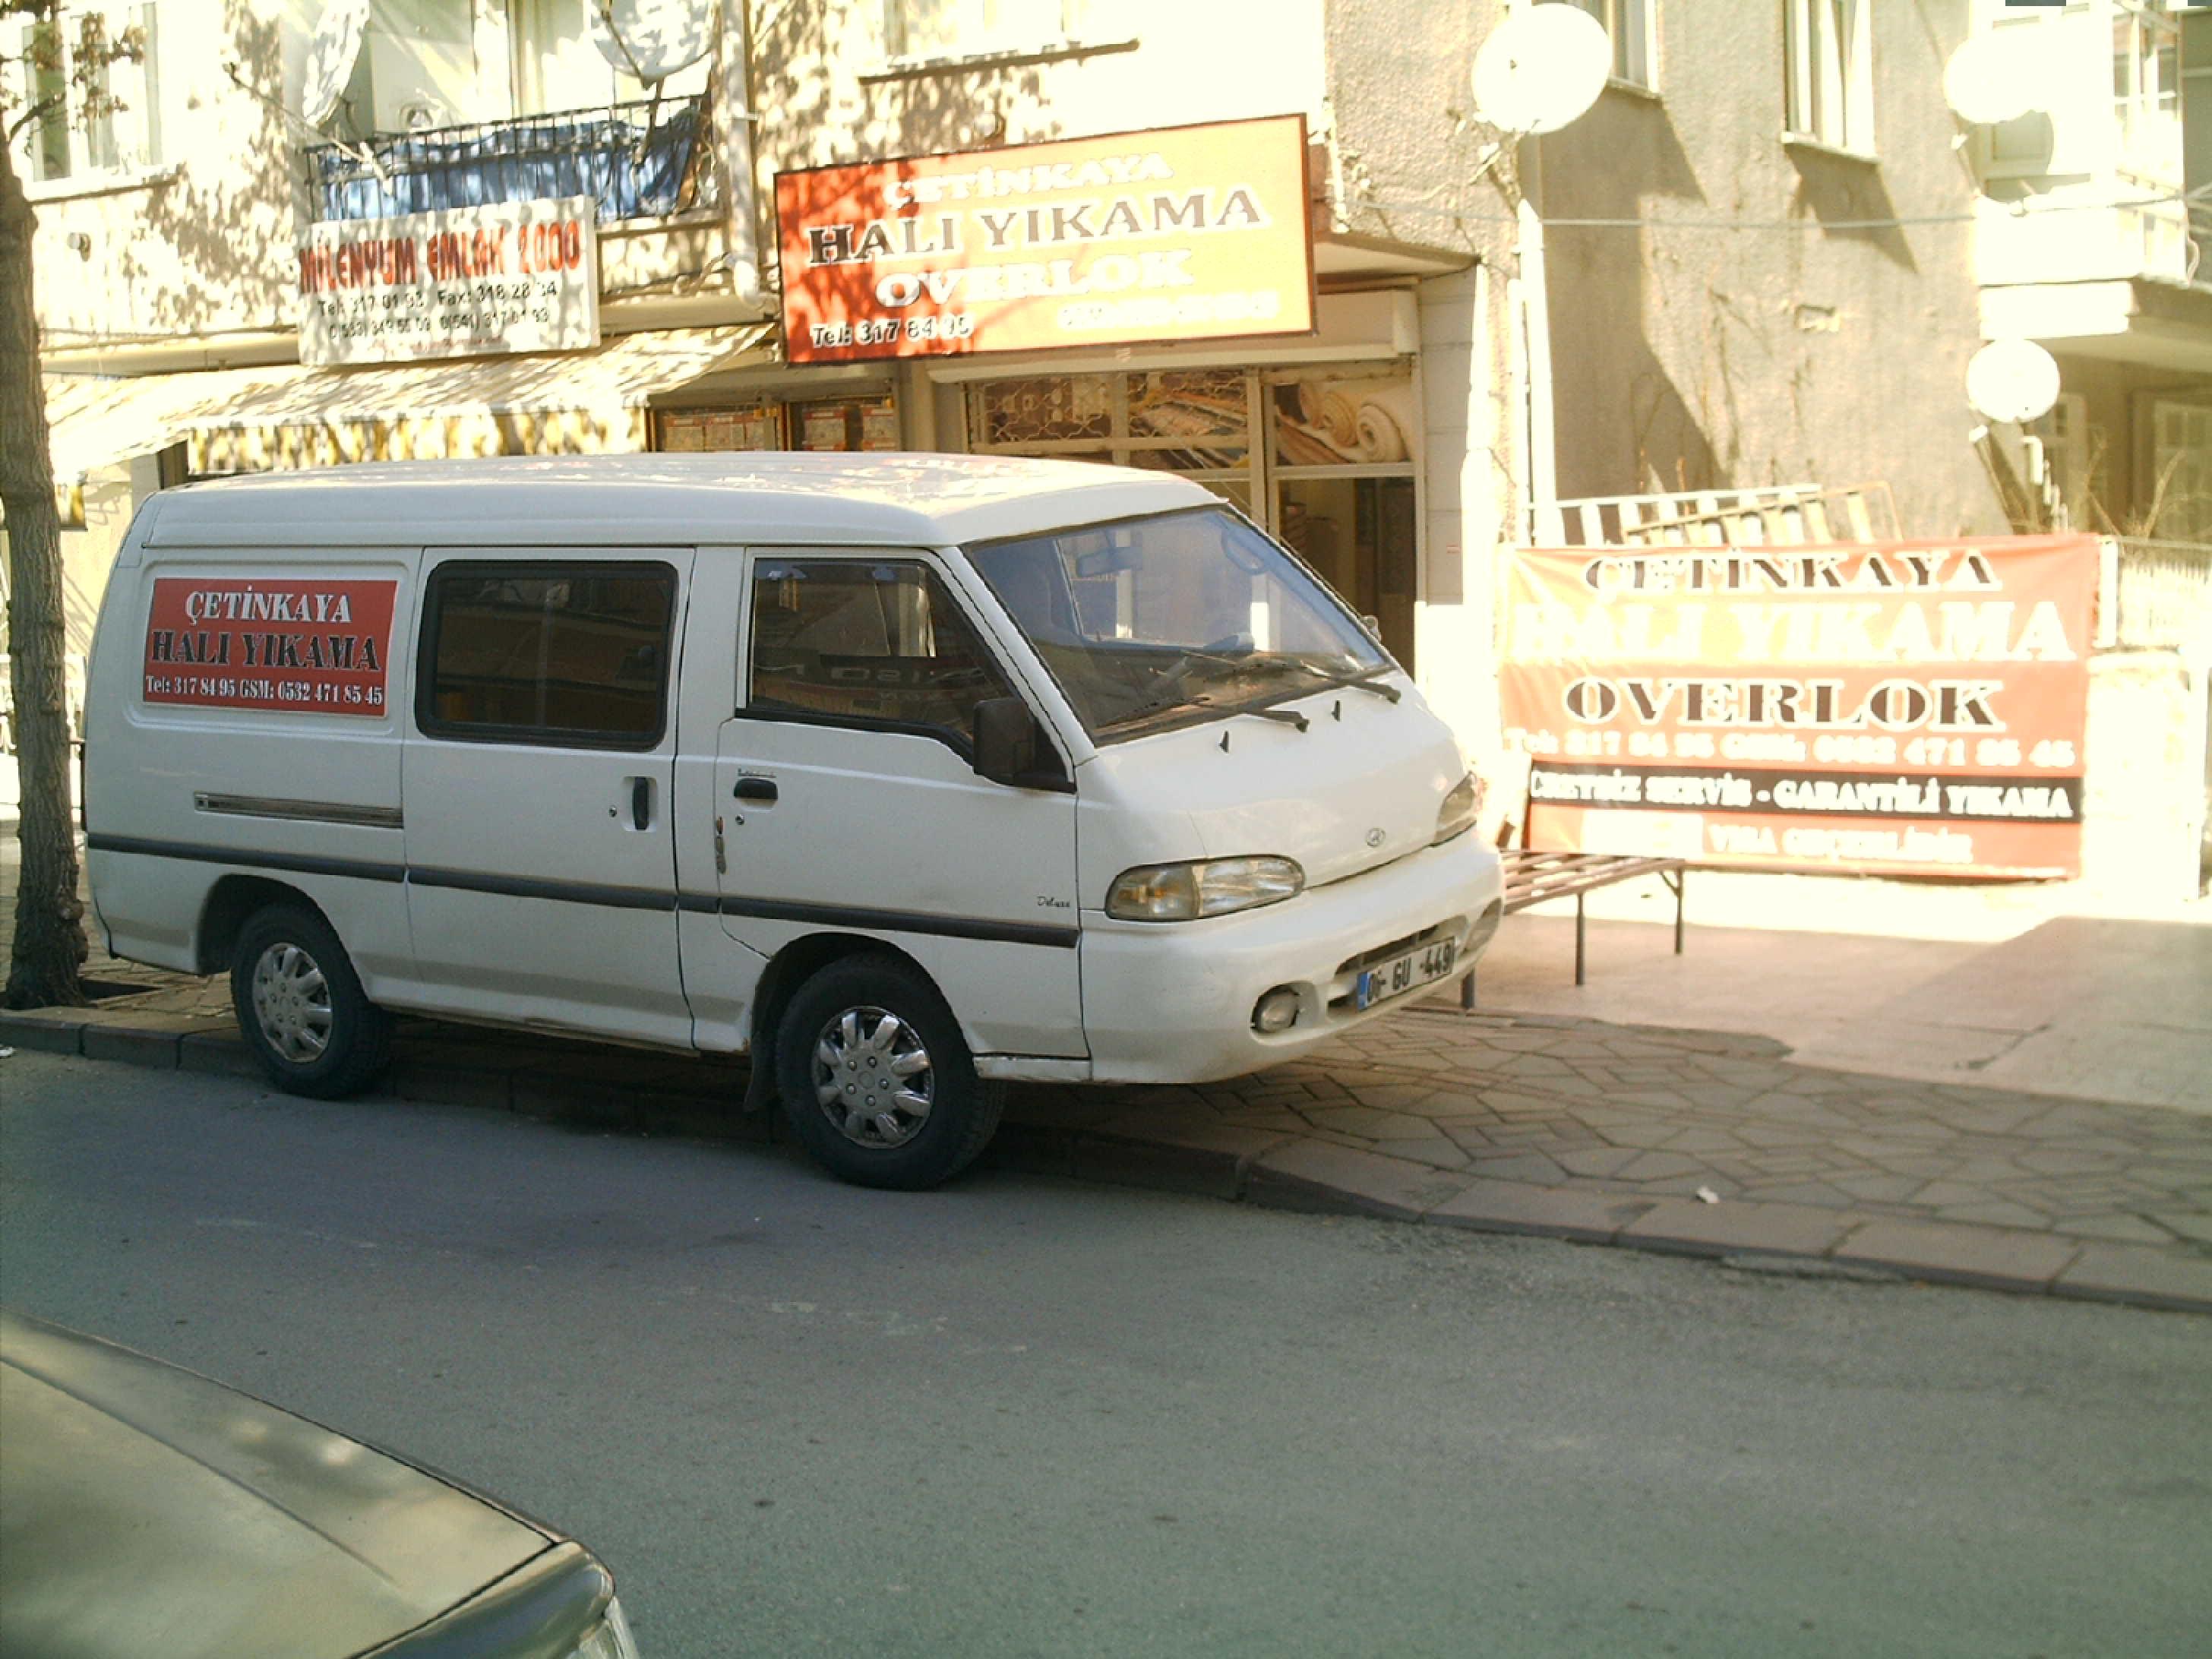 susuz_hali_yikama_servis-1 (3)